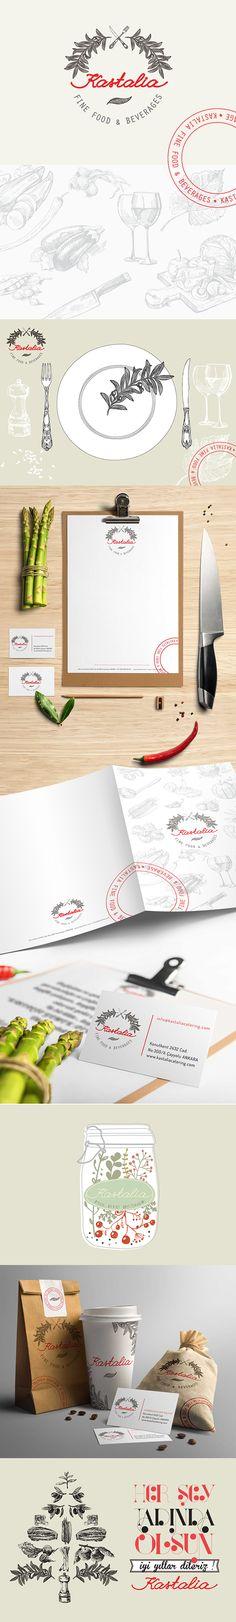 Kastalia on Behance , Designed by Neslihan GÖKÇE #branding #logotype